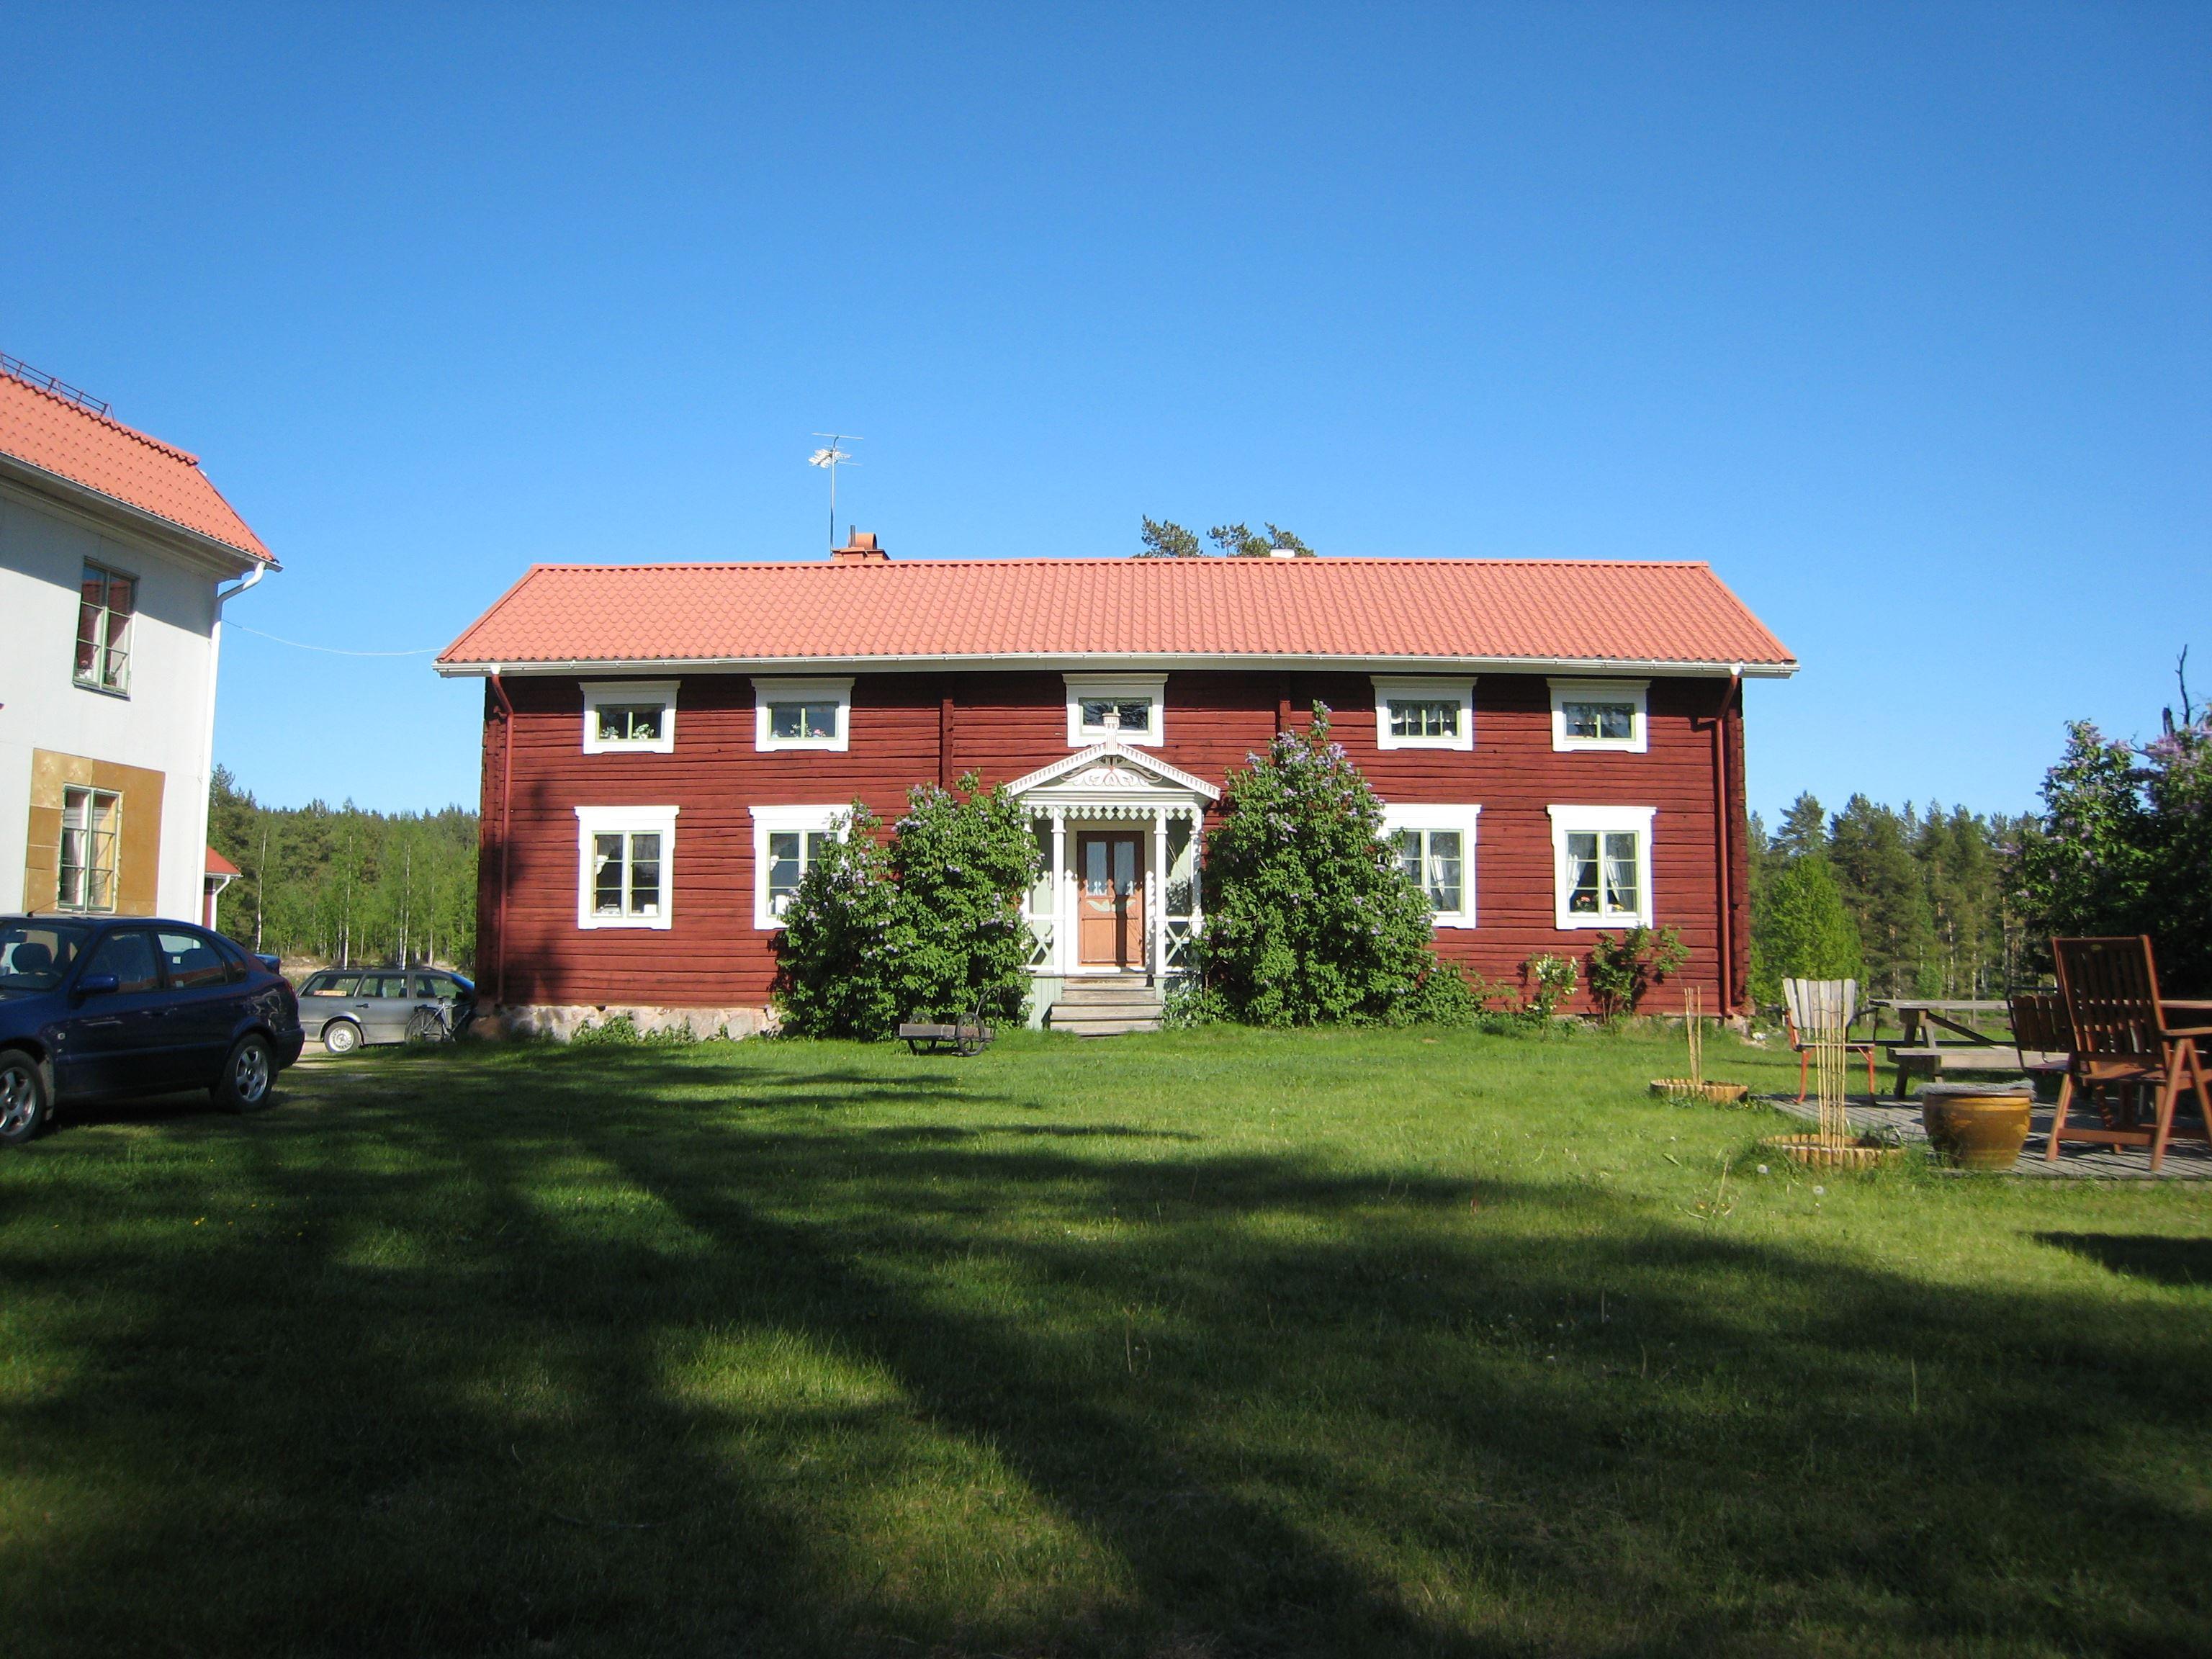 Bo på Hälsingegård Hisved i Långhed